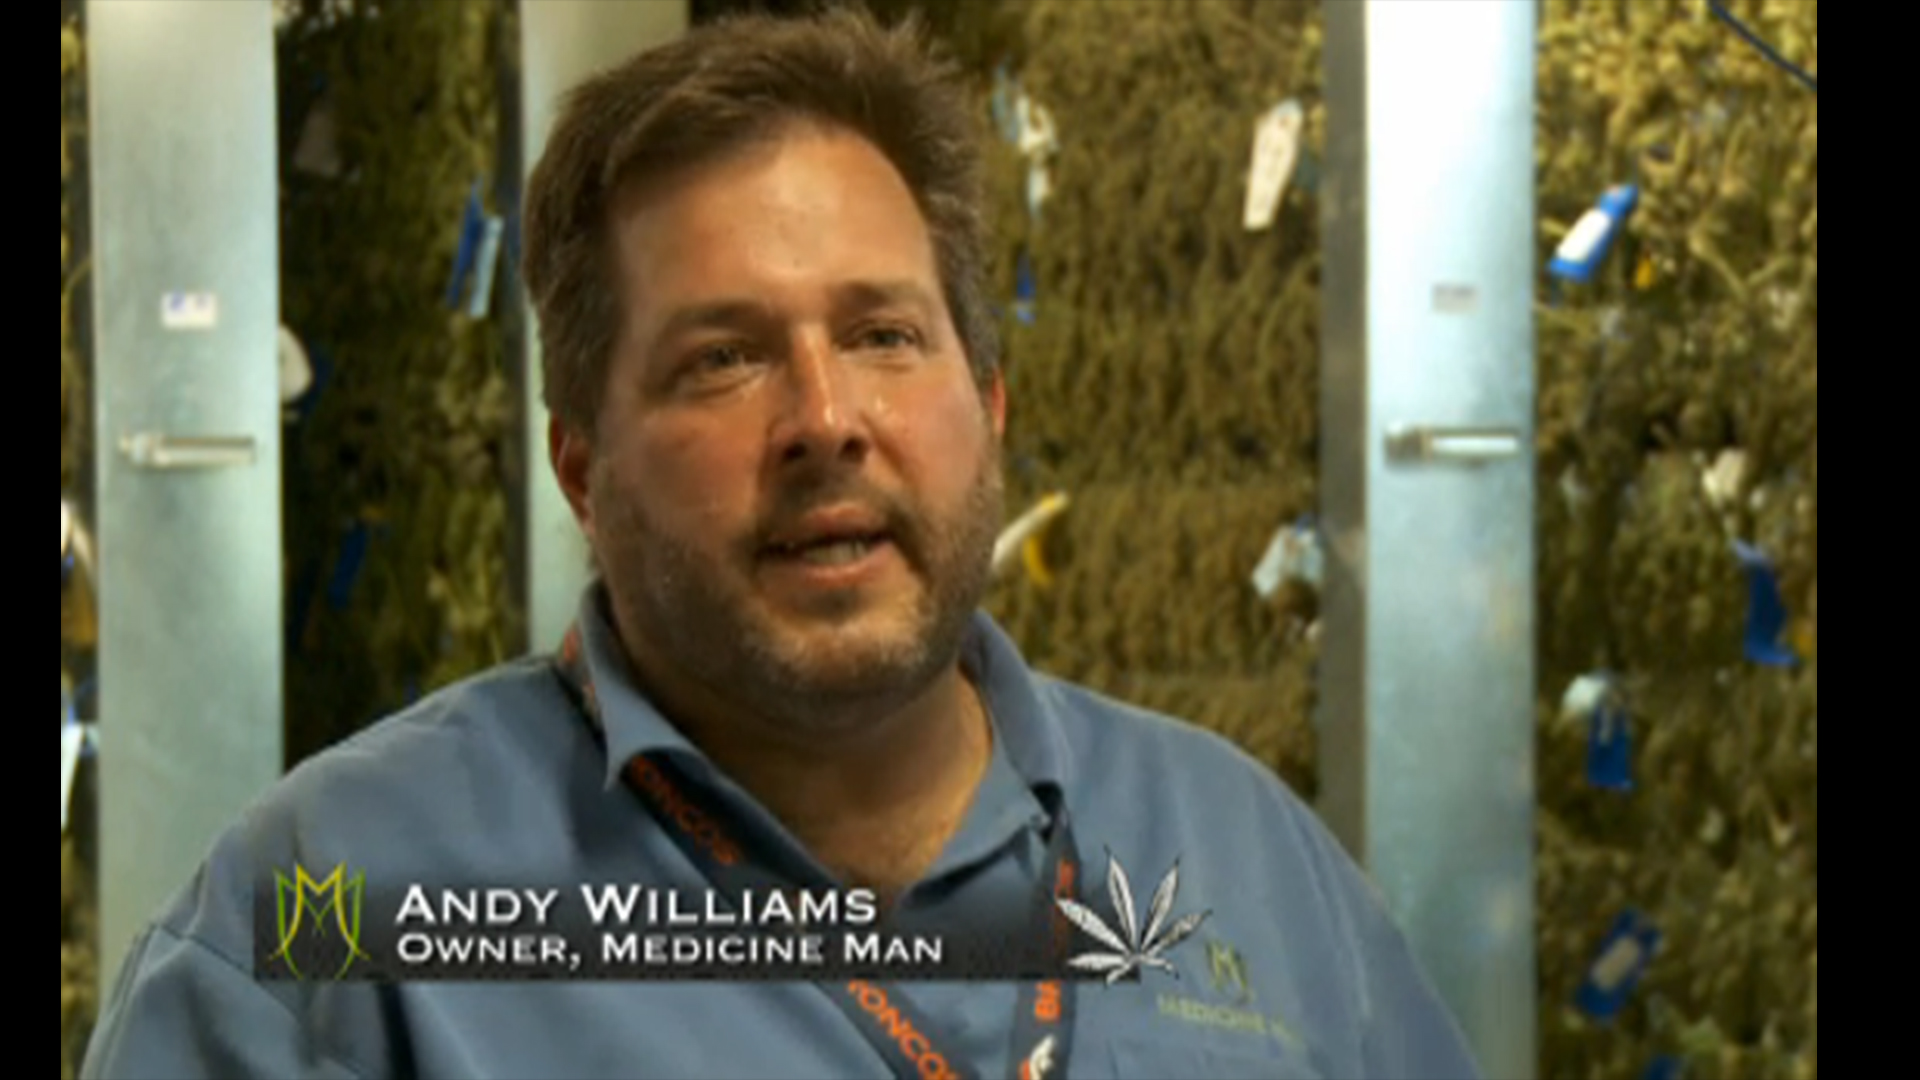 Pot Barons Bio: Medicine Man – Andy Williams